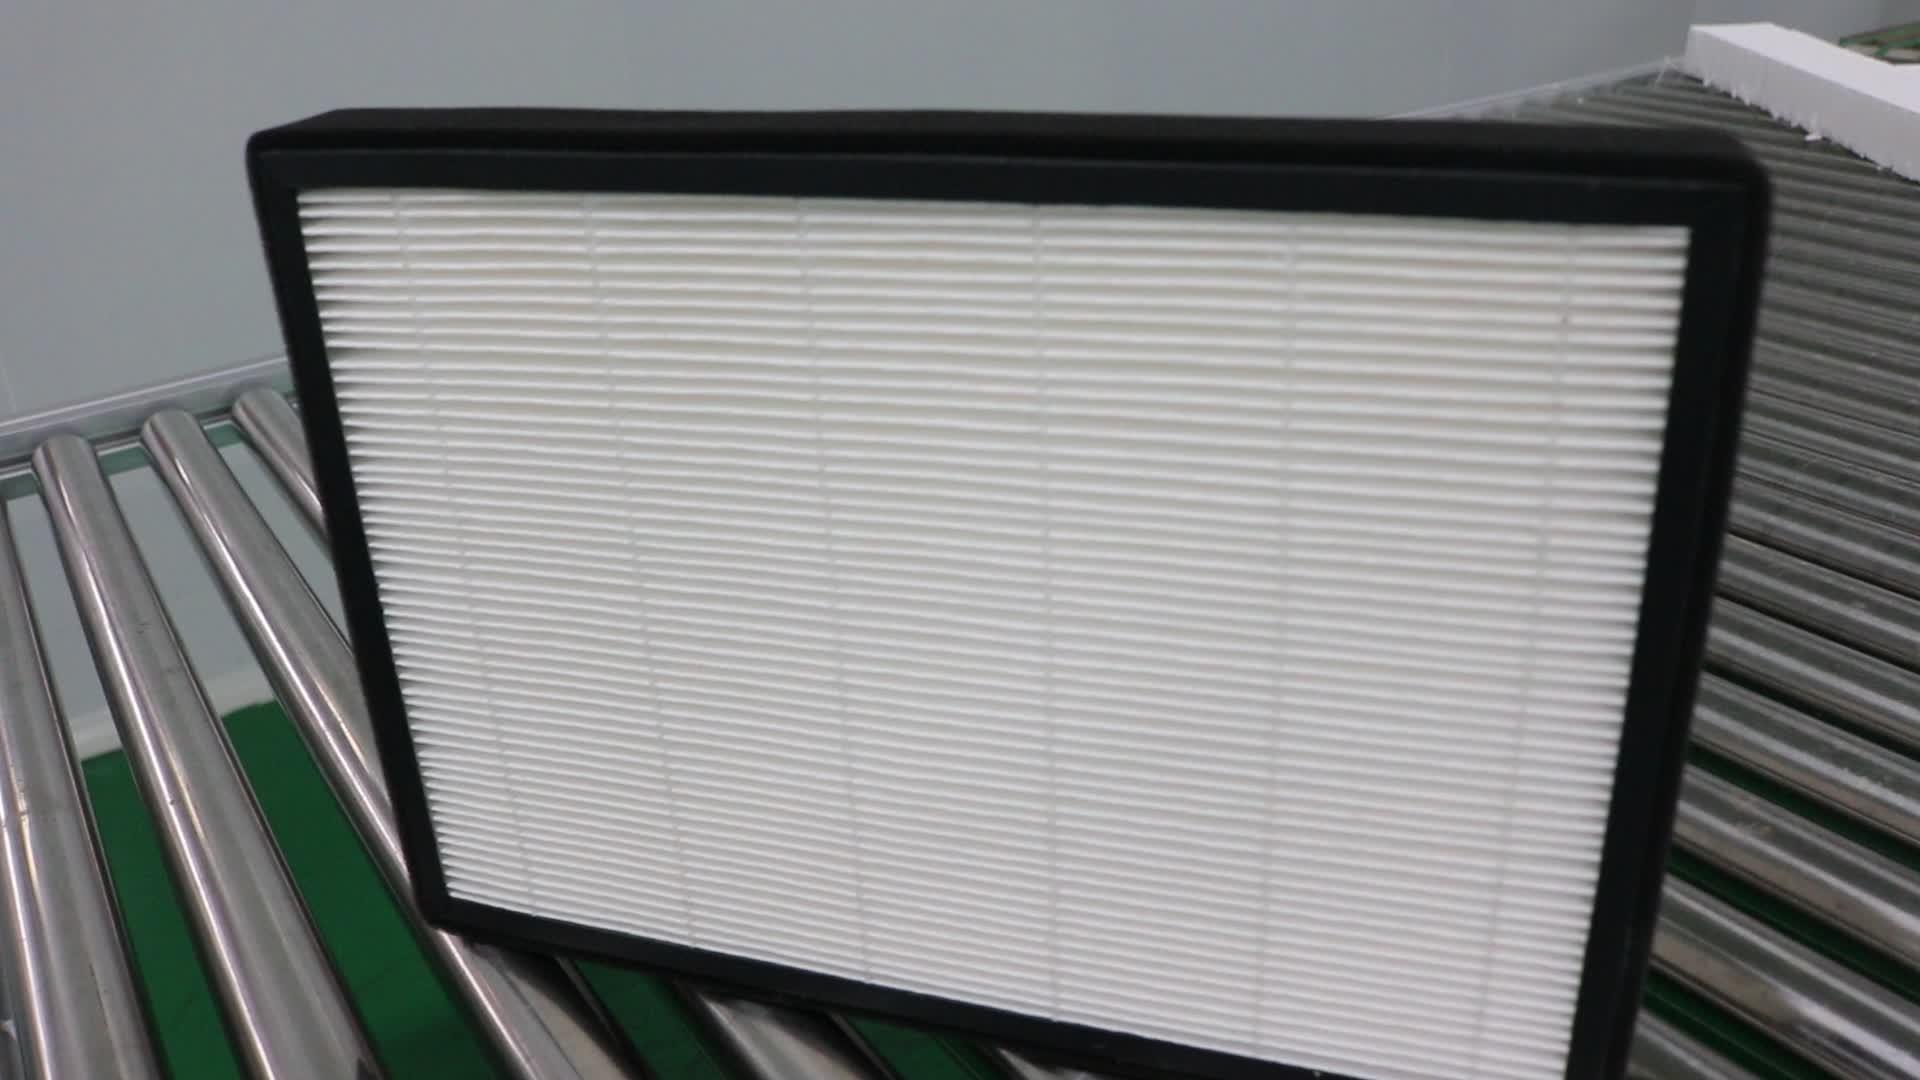 0.5 micron HEPA Air Purifier Filters